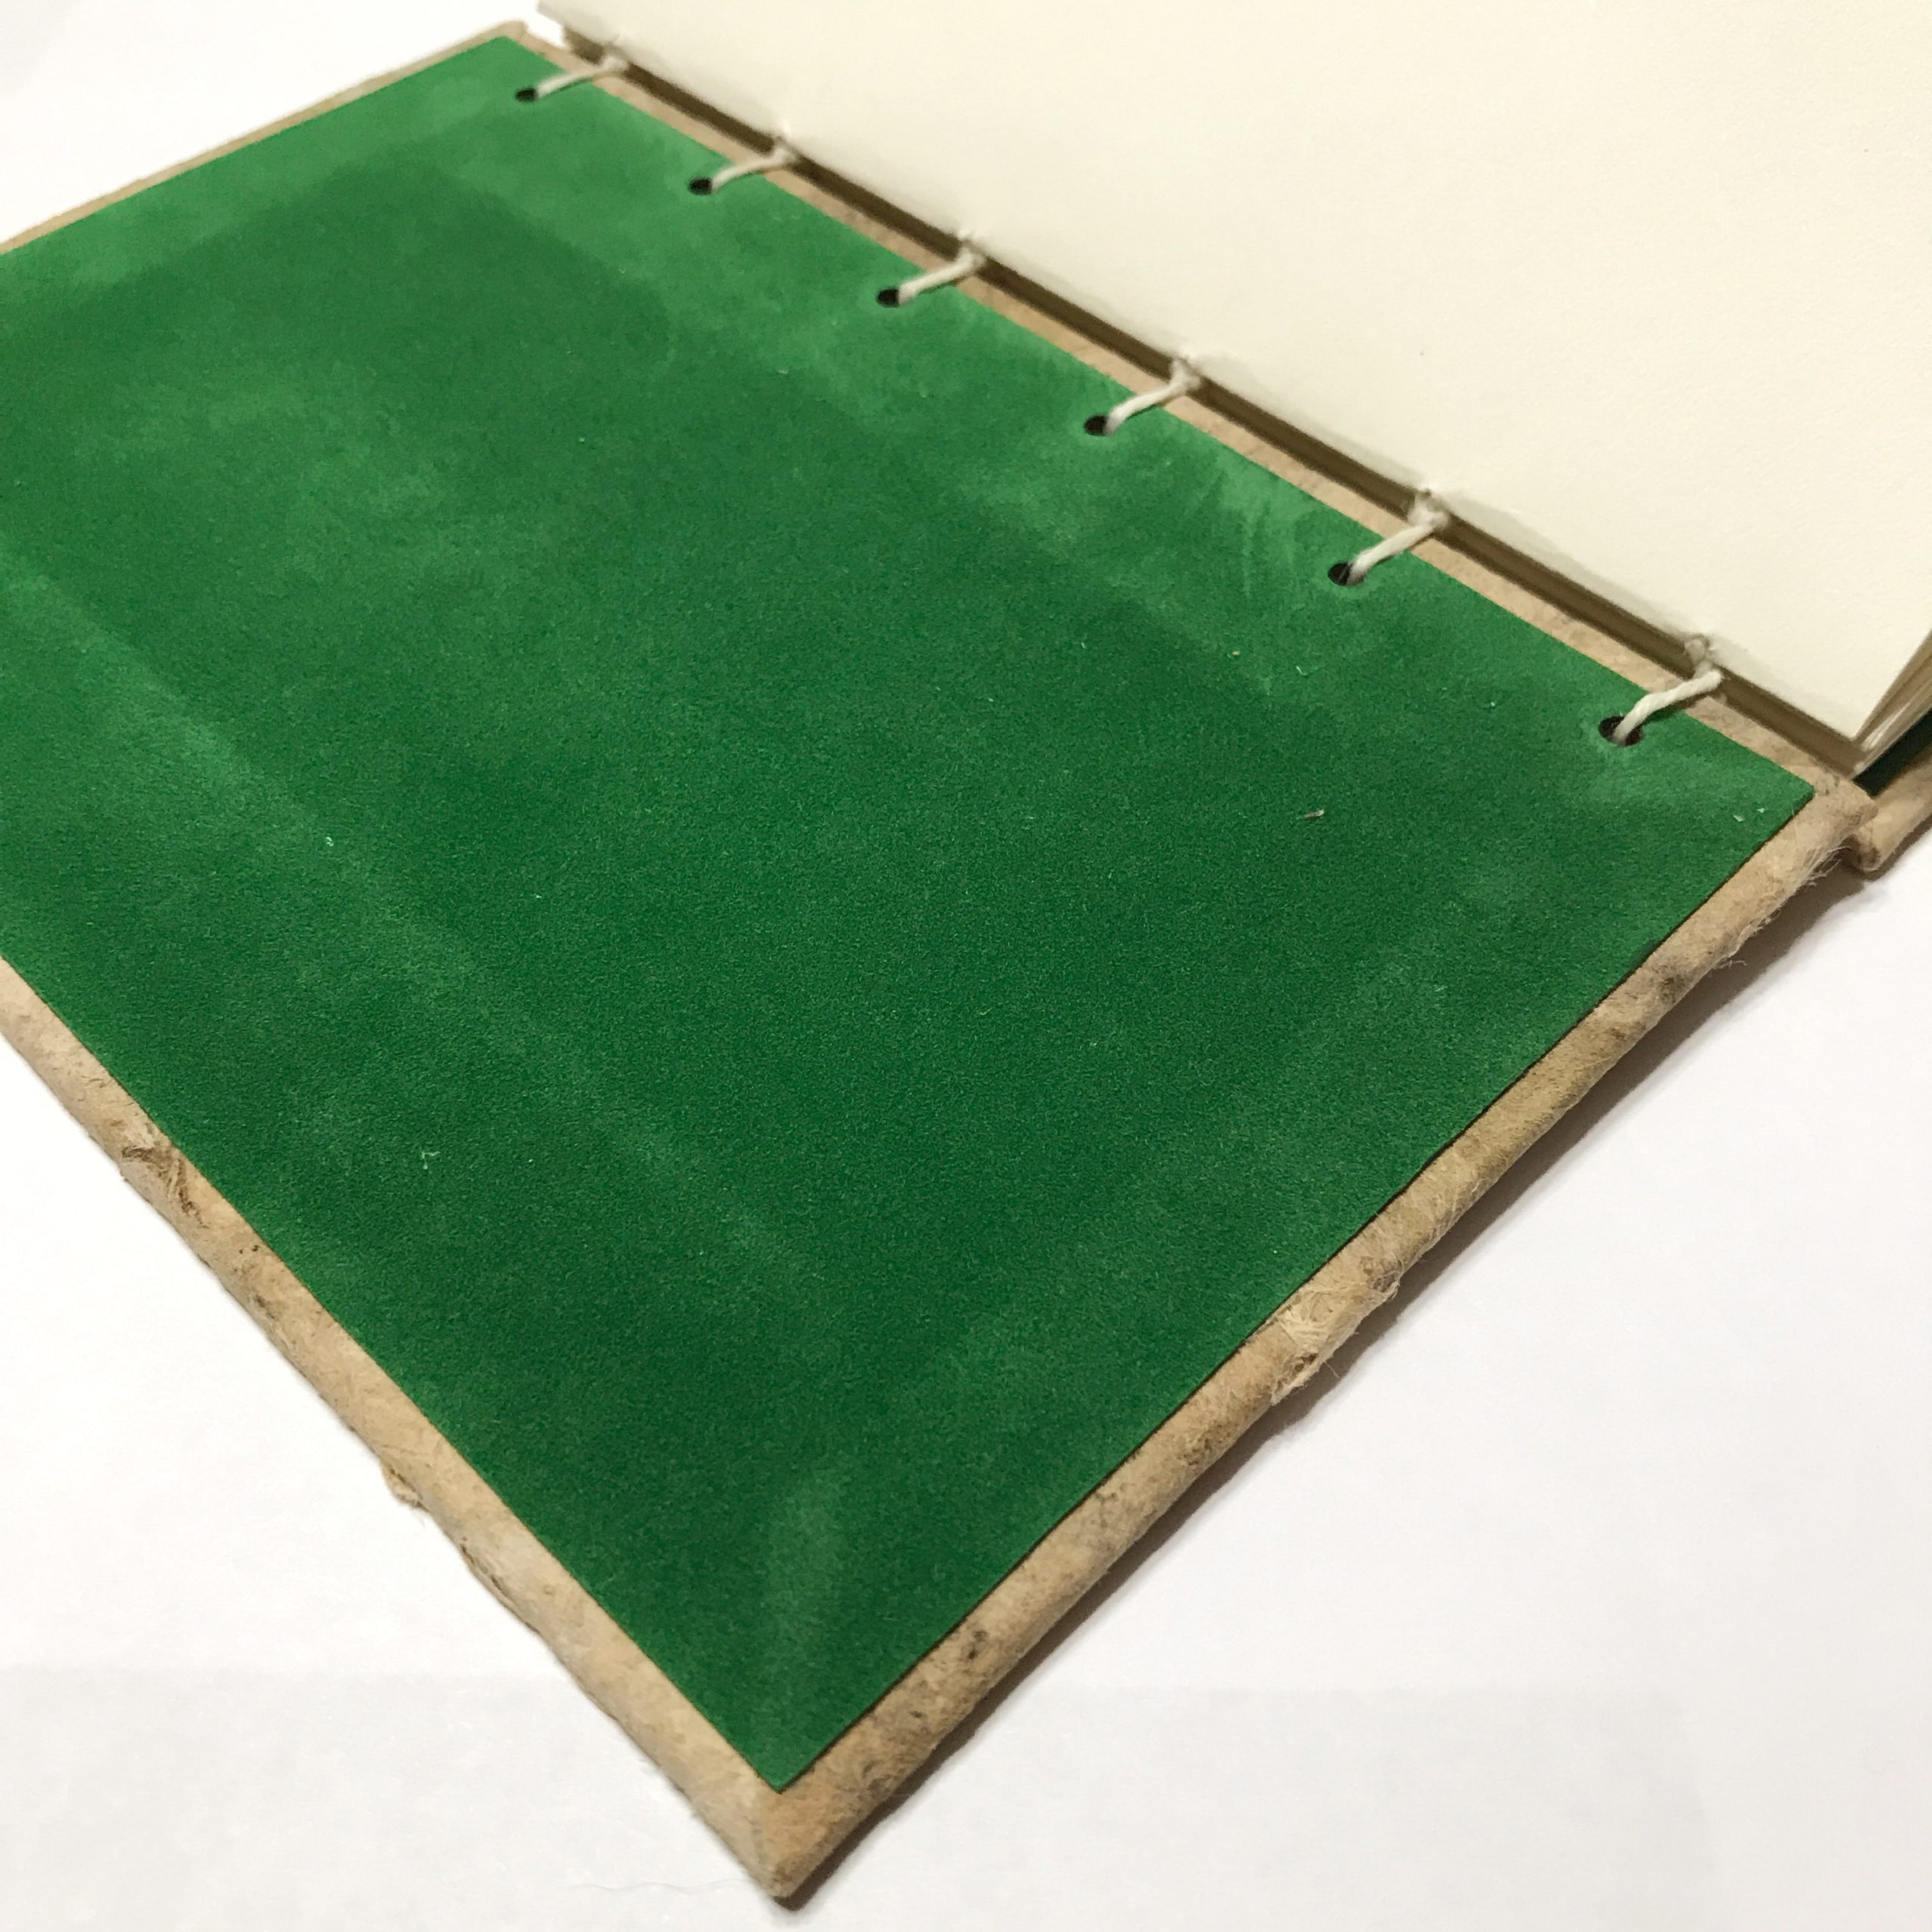 Inside cover of natural bark cover sketchbook with green velvet